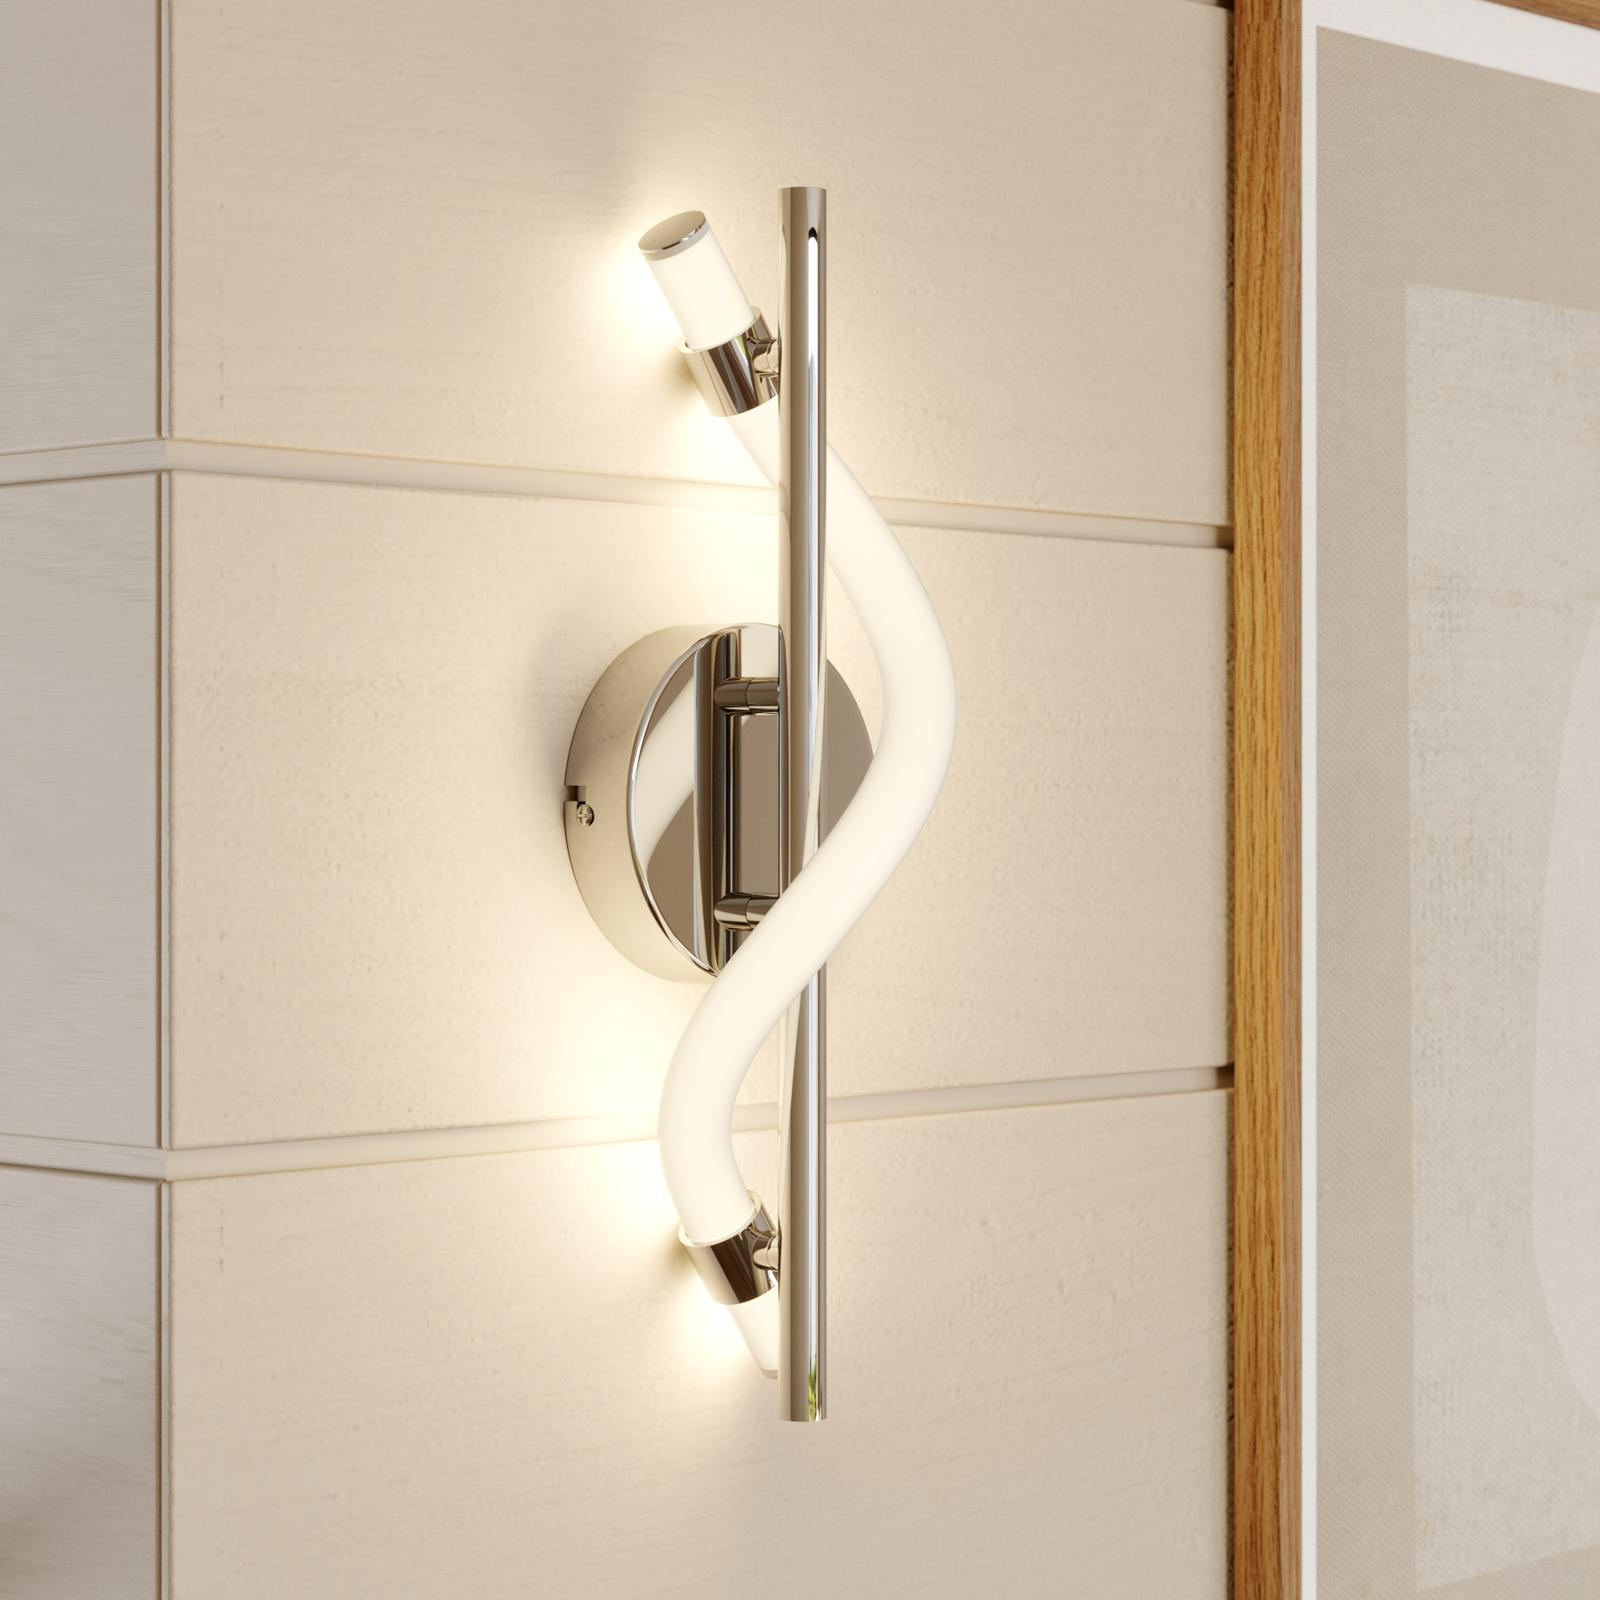 Lucande Curla LED-Wandleuchte in Chrom